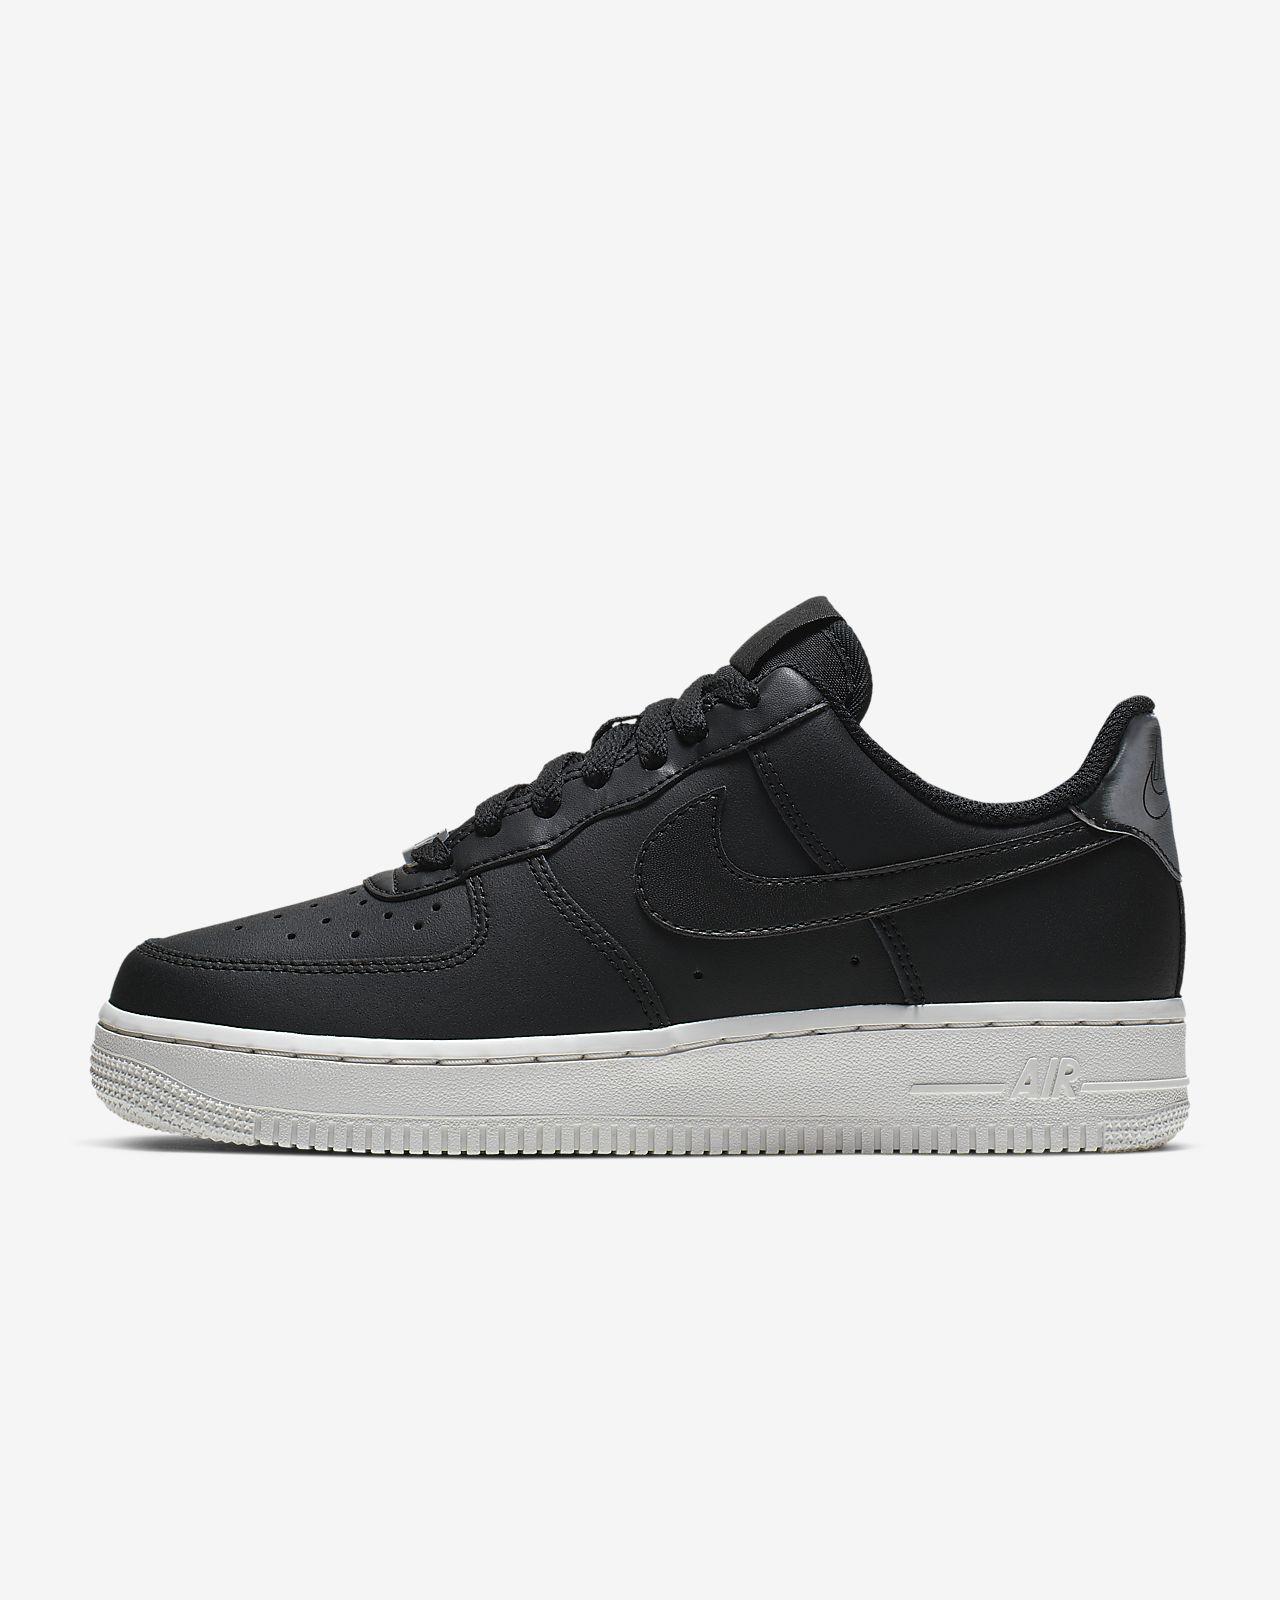 detailed look 03547 da663 ... Chaussure Nike Air Force 1  07 Essential pour Femme